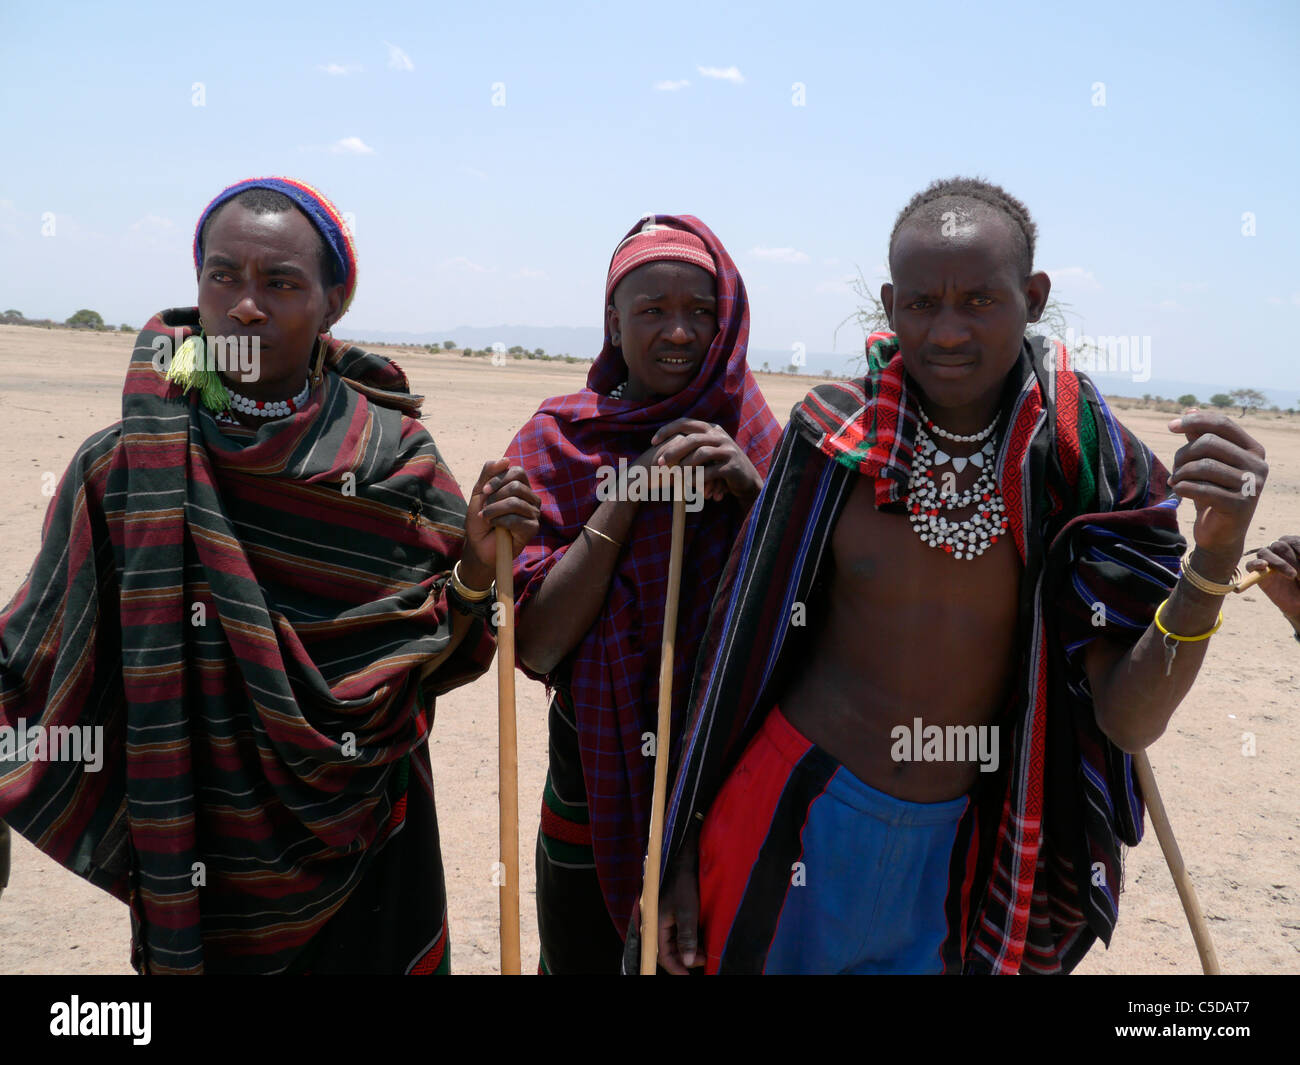 TANZANIA Watatulu tribesmen of Miyuguyu, Shinyanga district. Group of men wearing traditional clothes and beads. Stock Photo